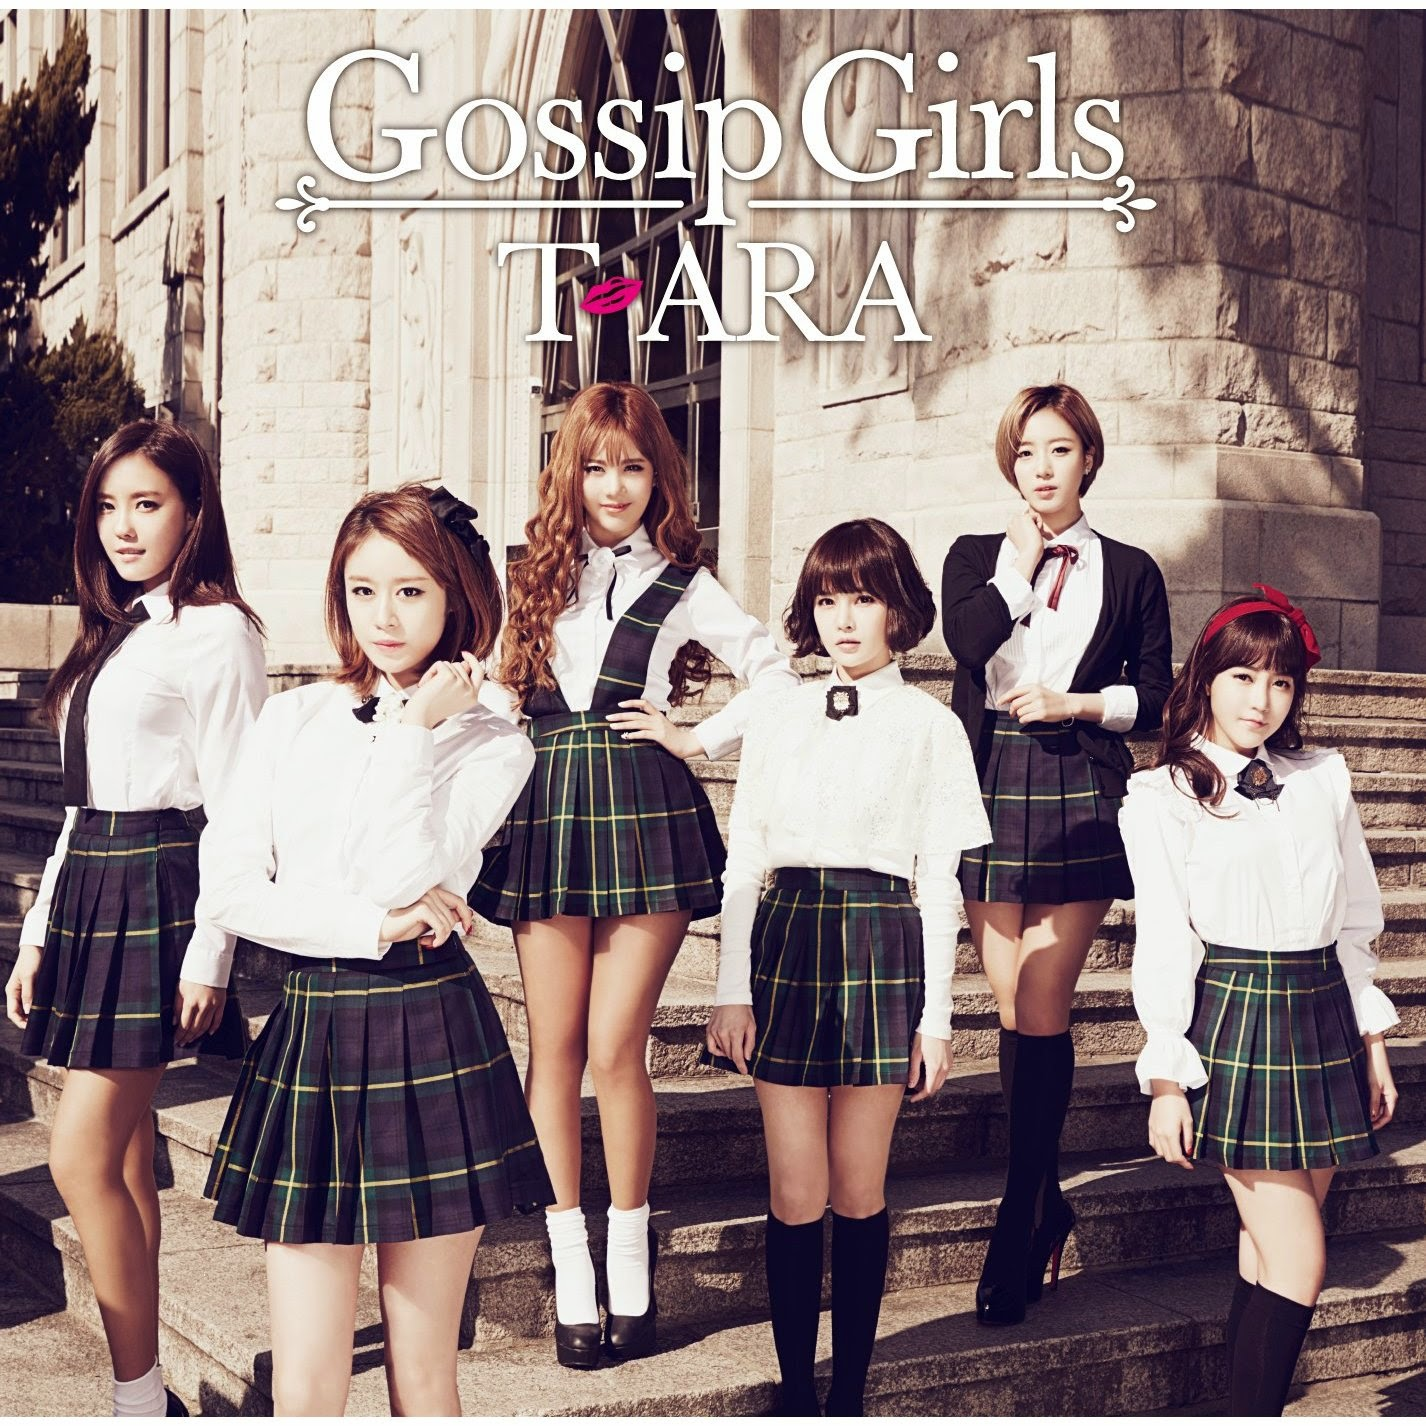 purara s music mp3 t ara gossip girls